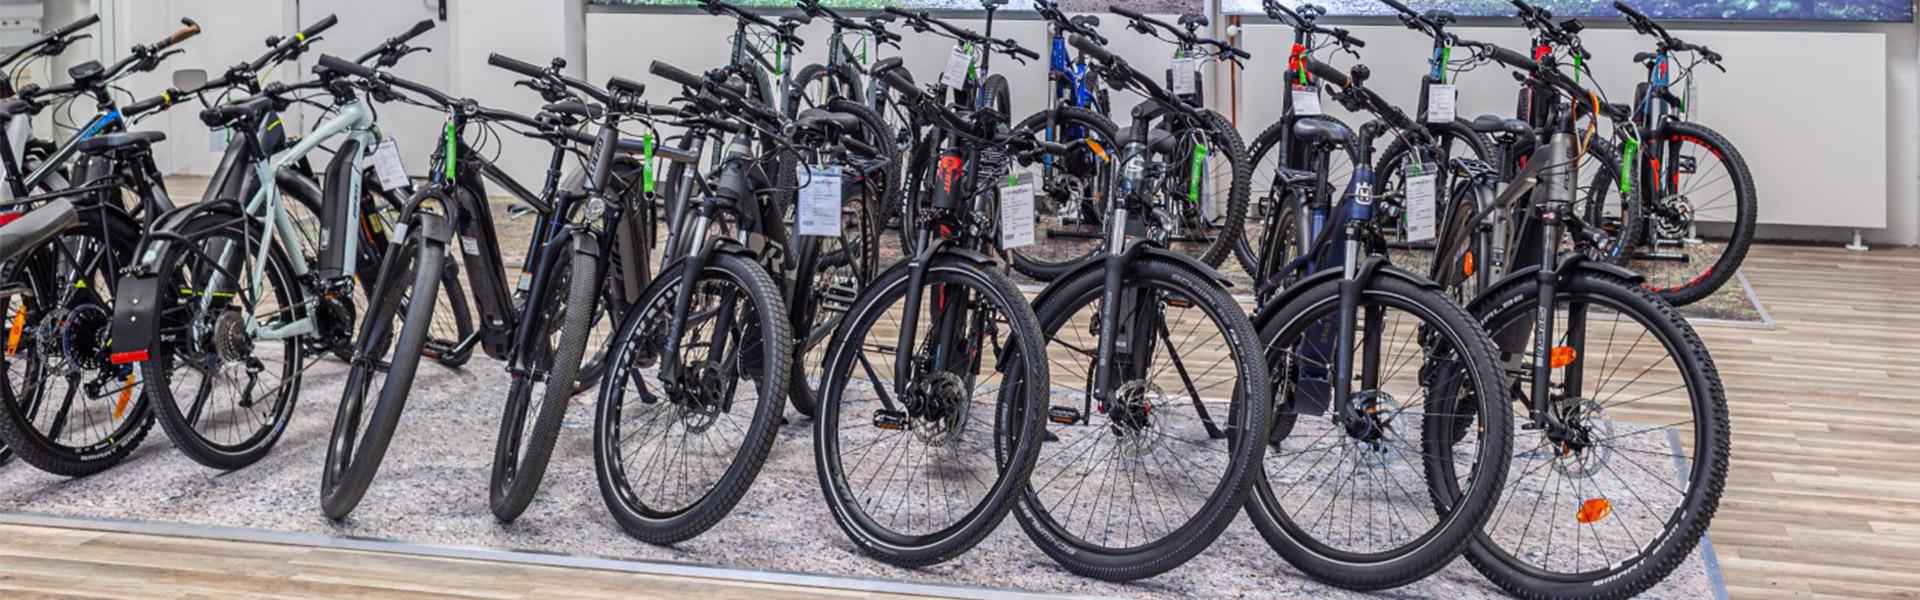 Der Shop der e-motion e-Bike Welt Moers